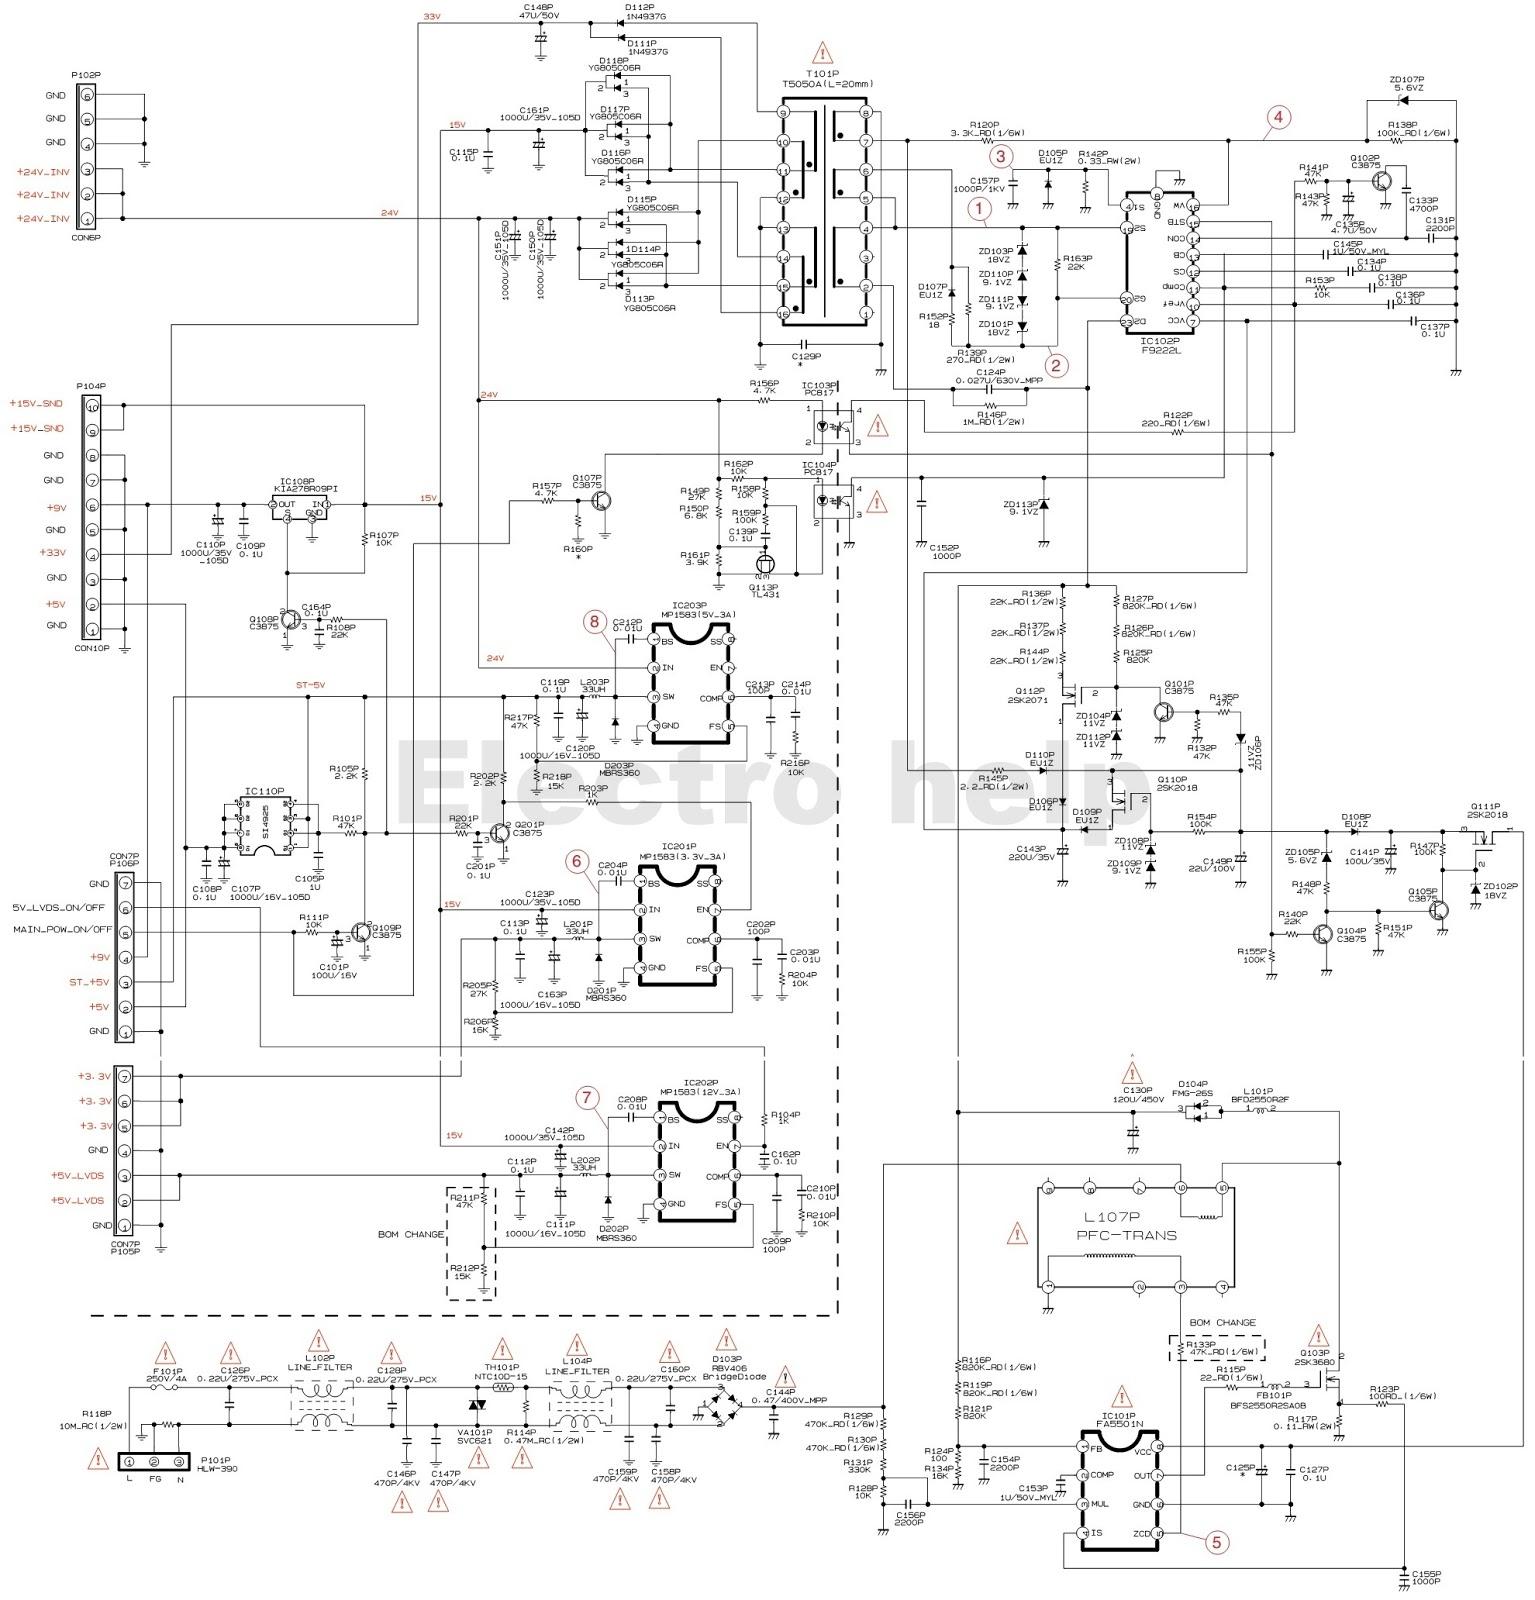 medium resolution of john deere 245 wiring diagram wiring schematic diagram 94john deere 245 wiring diagram wiring library john